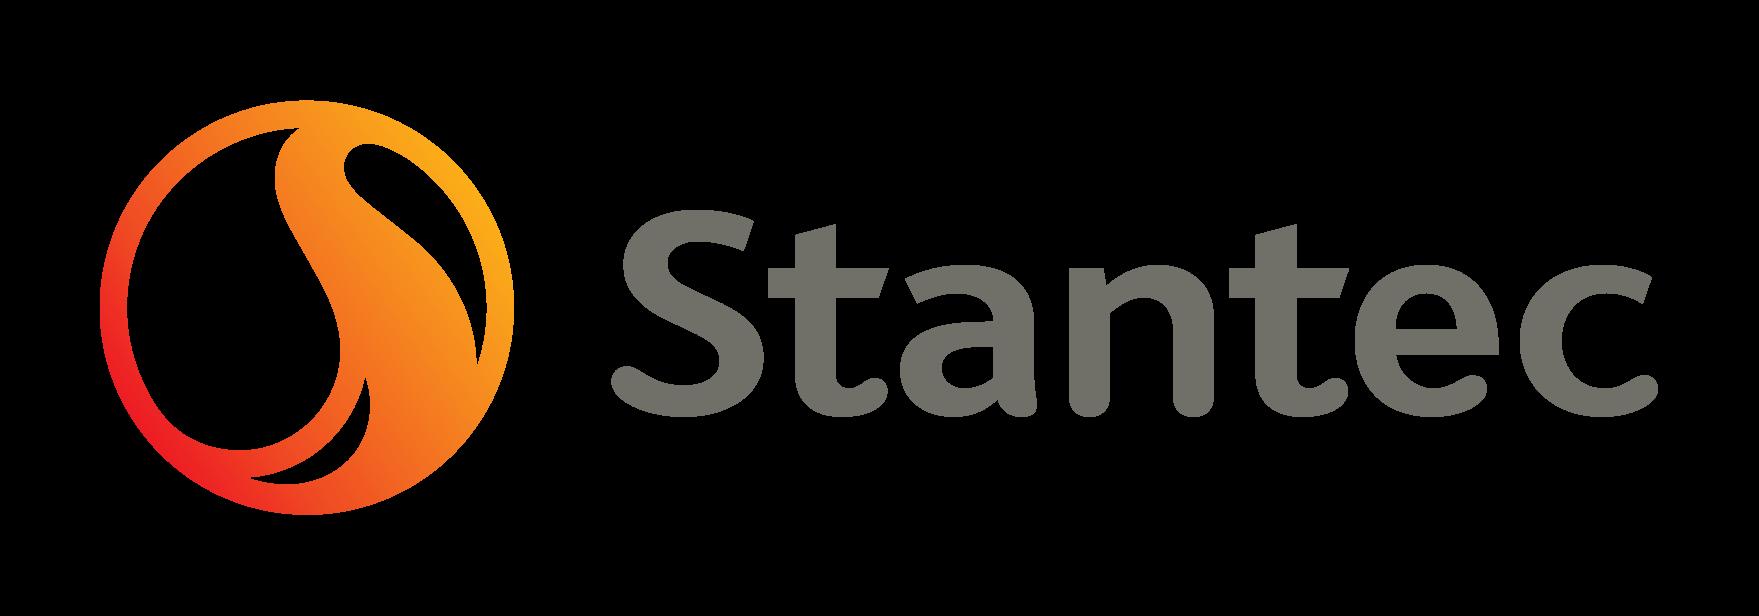 Stantec_Logo.png